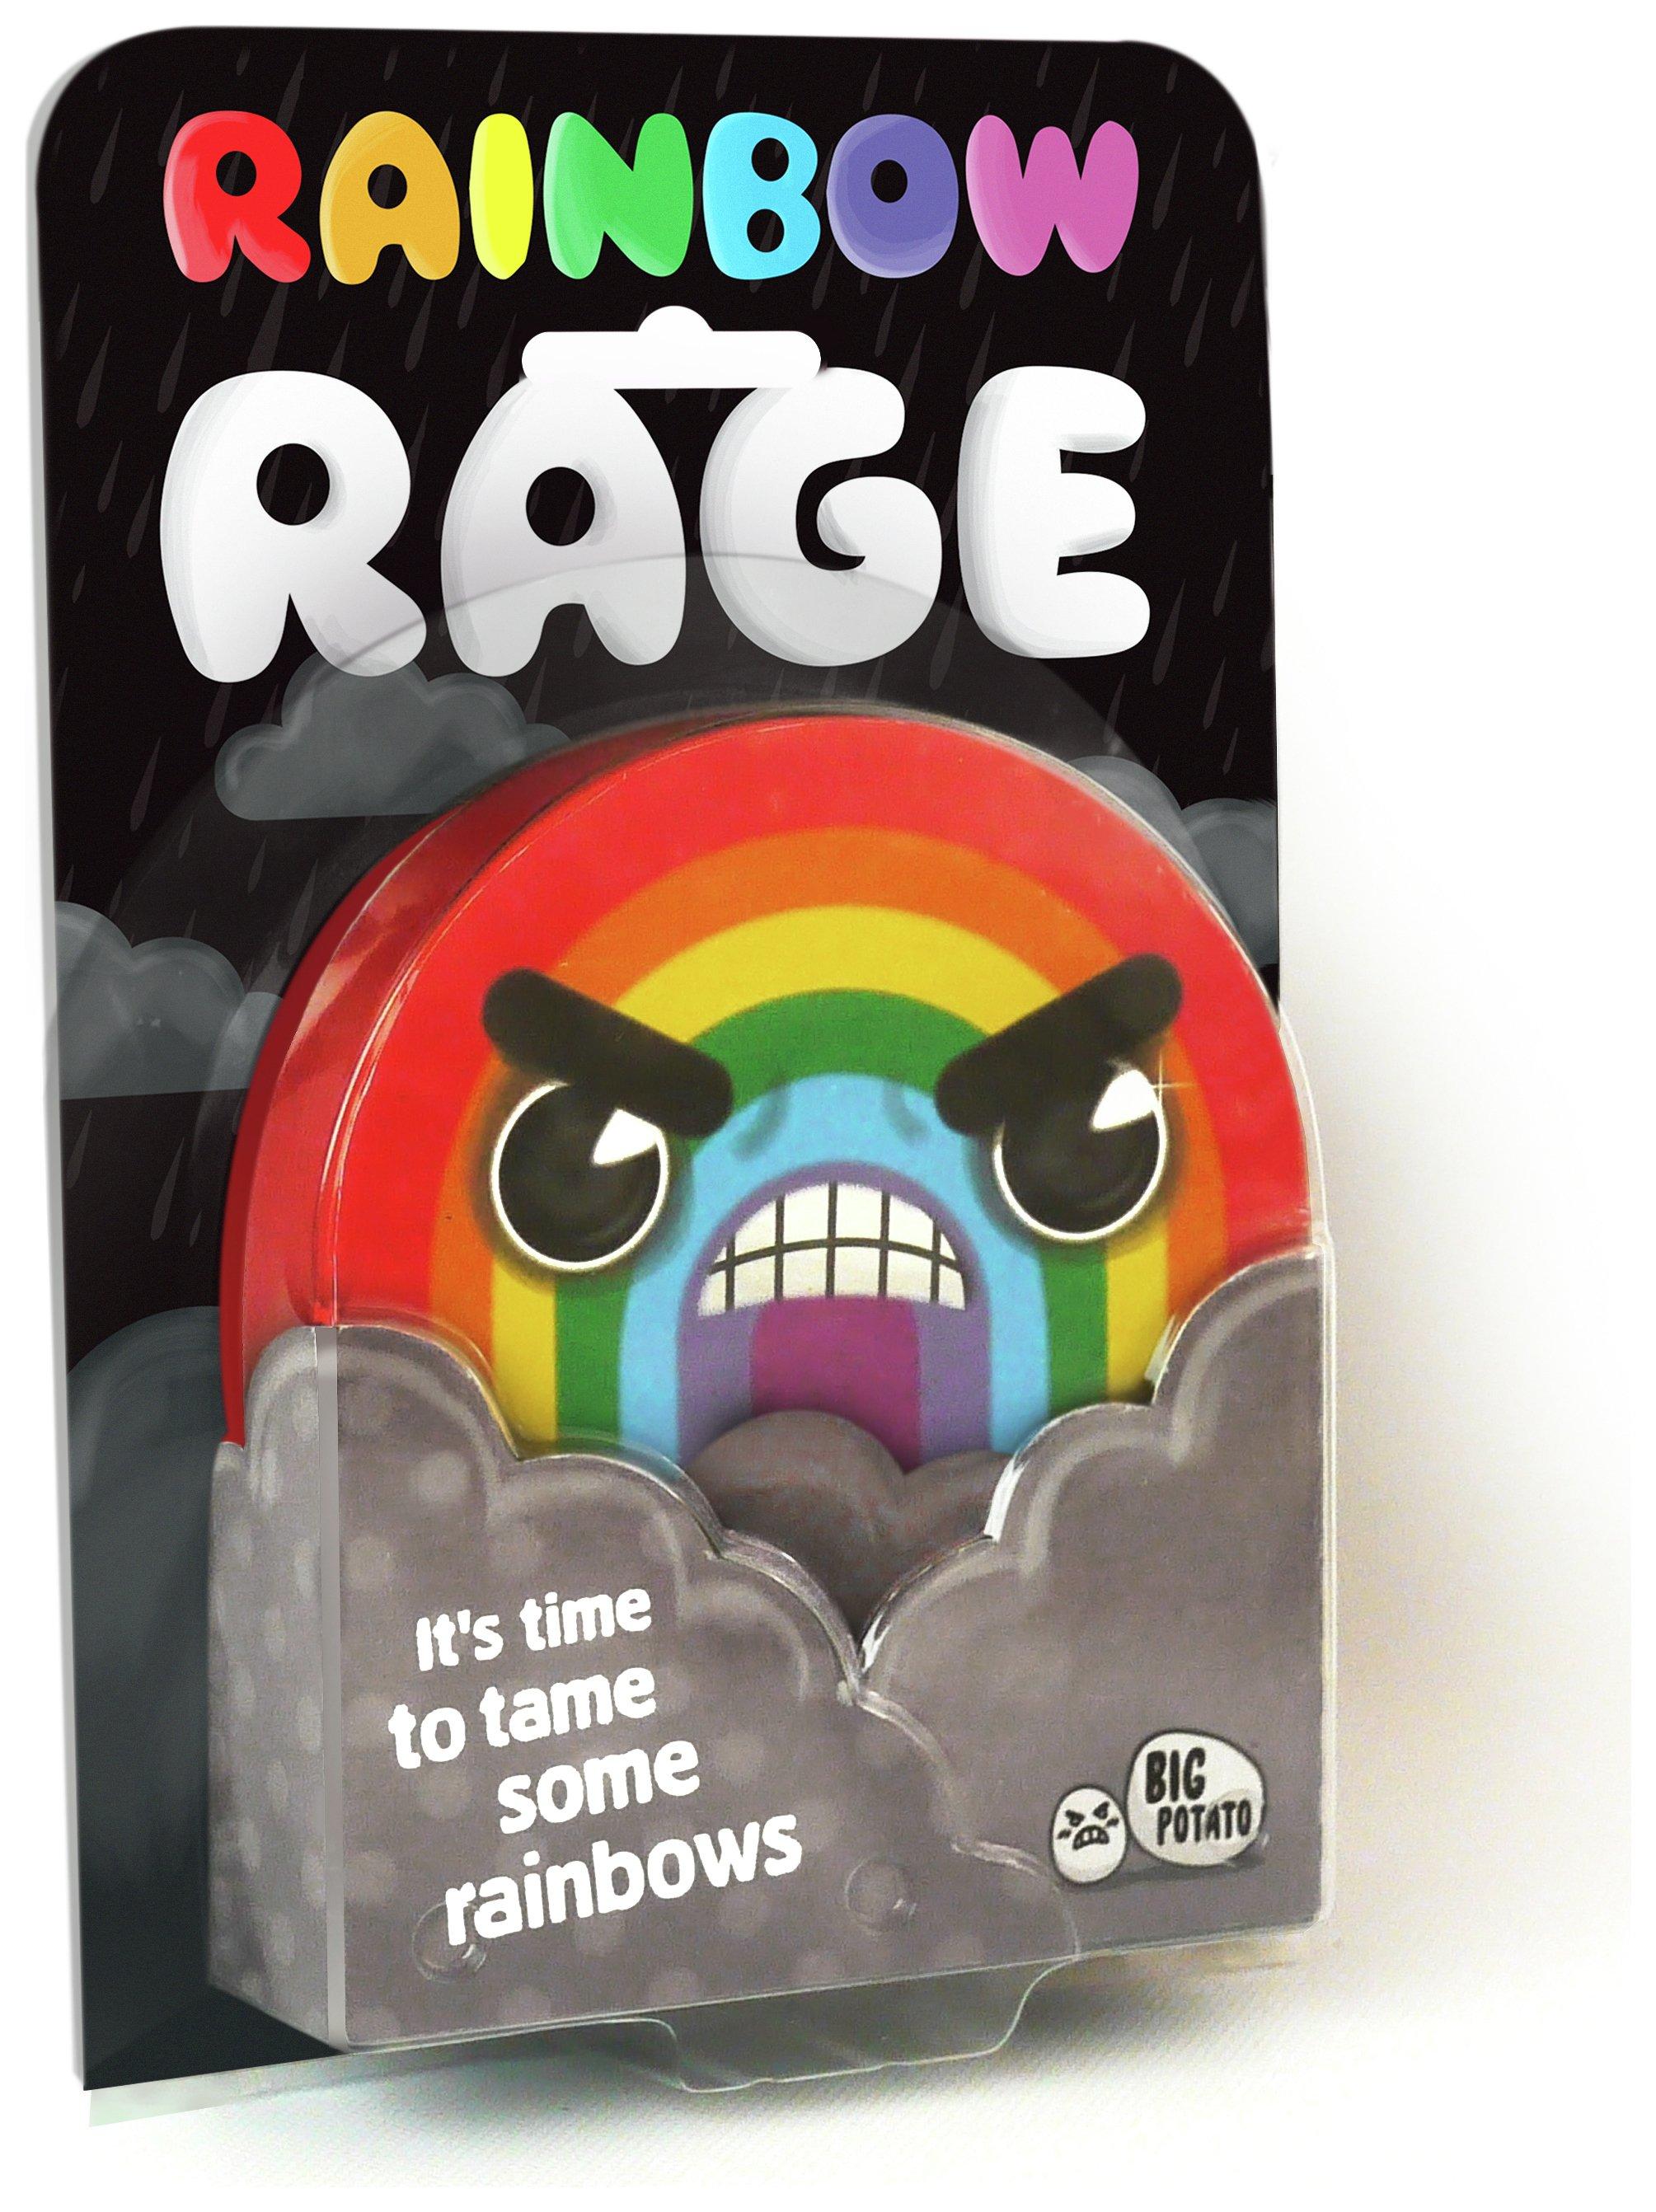 Image of Big Potato Rainbow Rage Game.